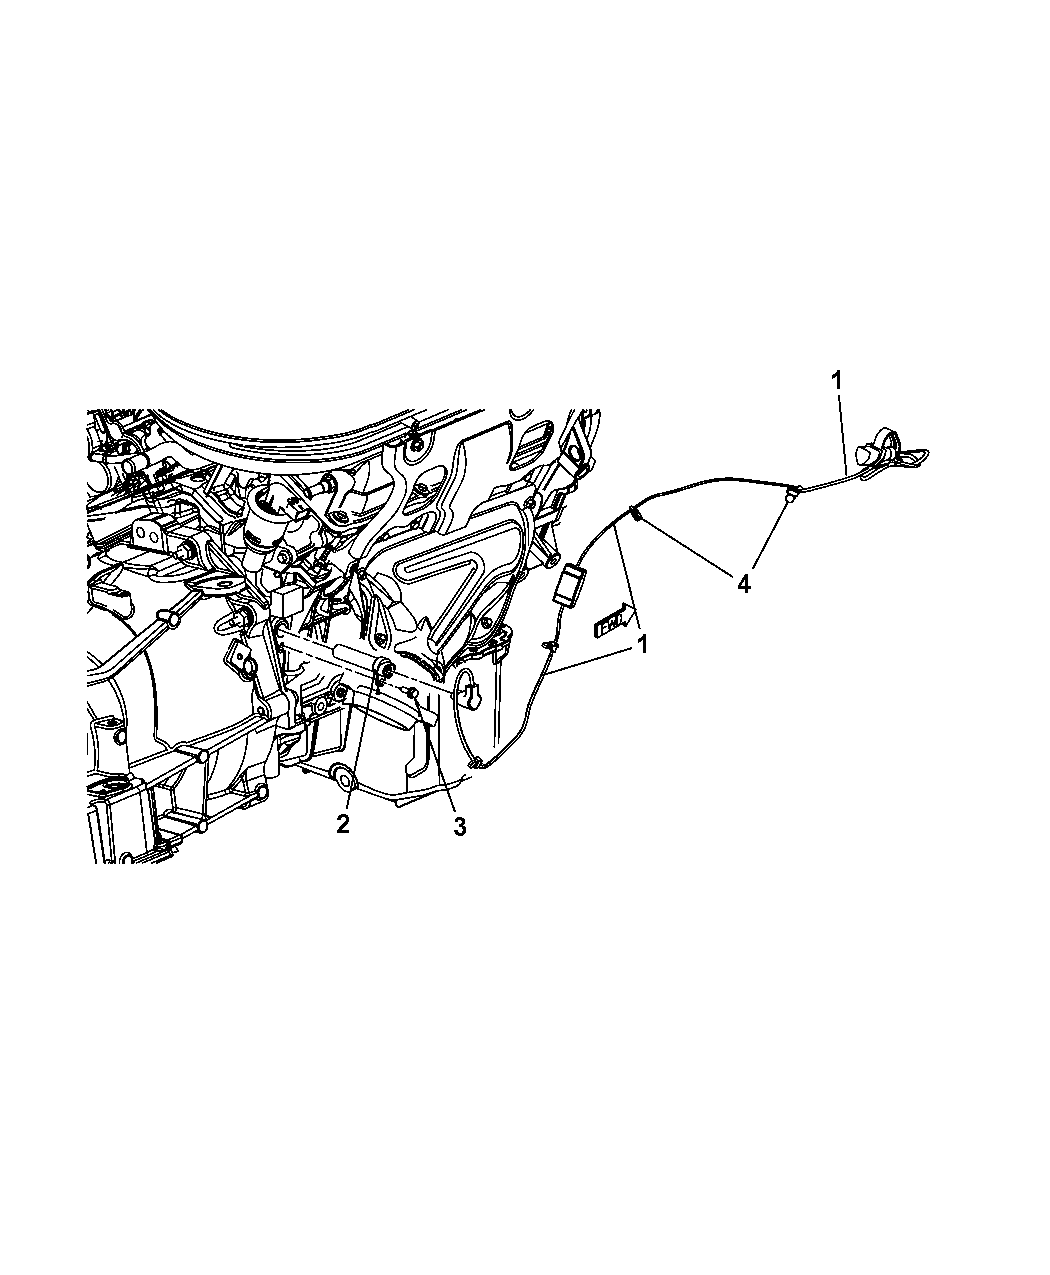 Fuel Injection System Diagram On Daihatsu Charade Vacuum Hose Diagram